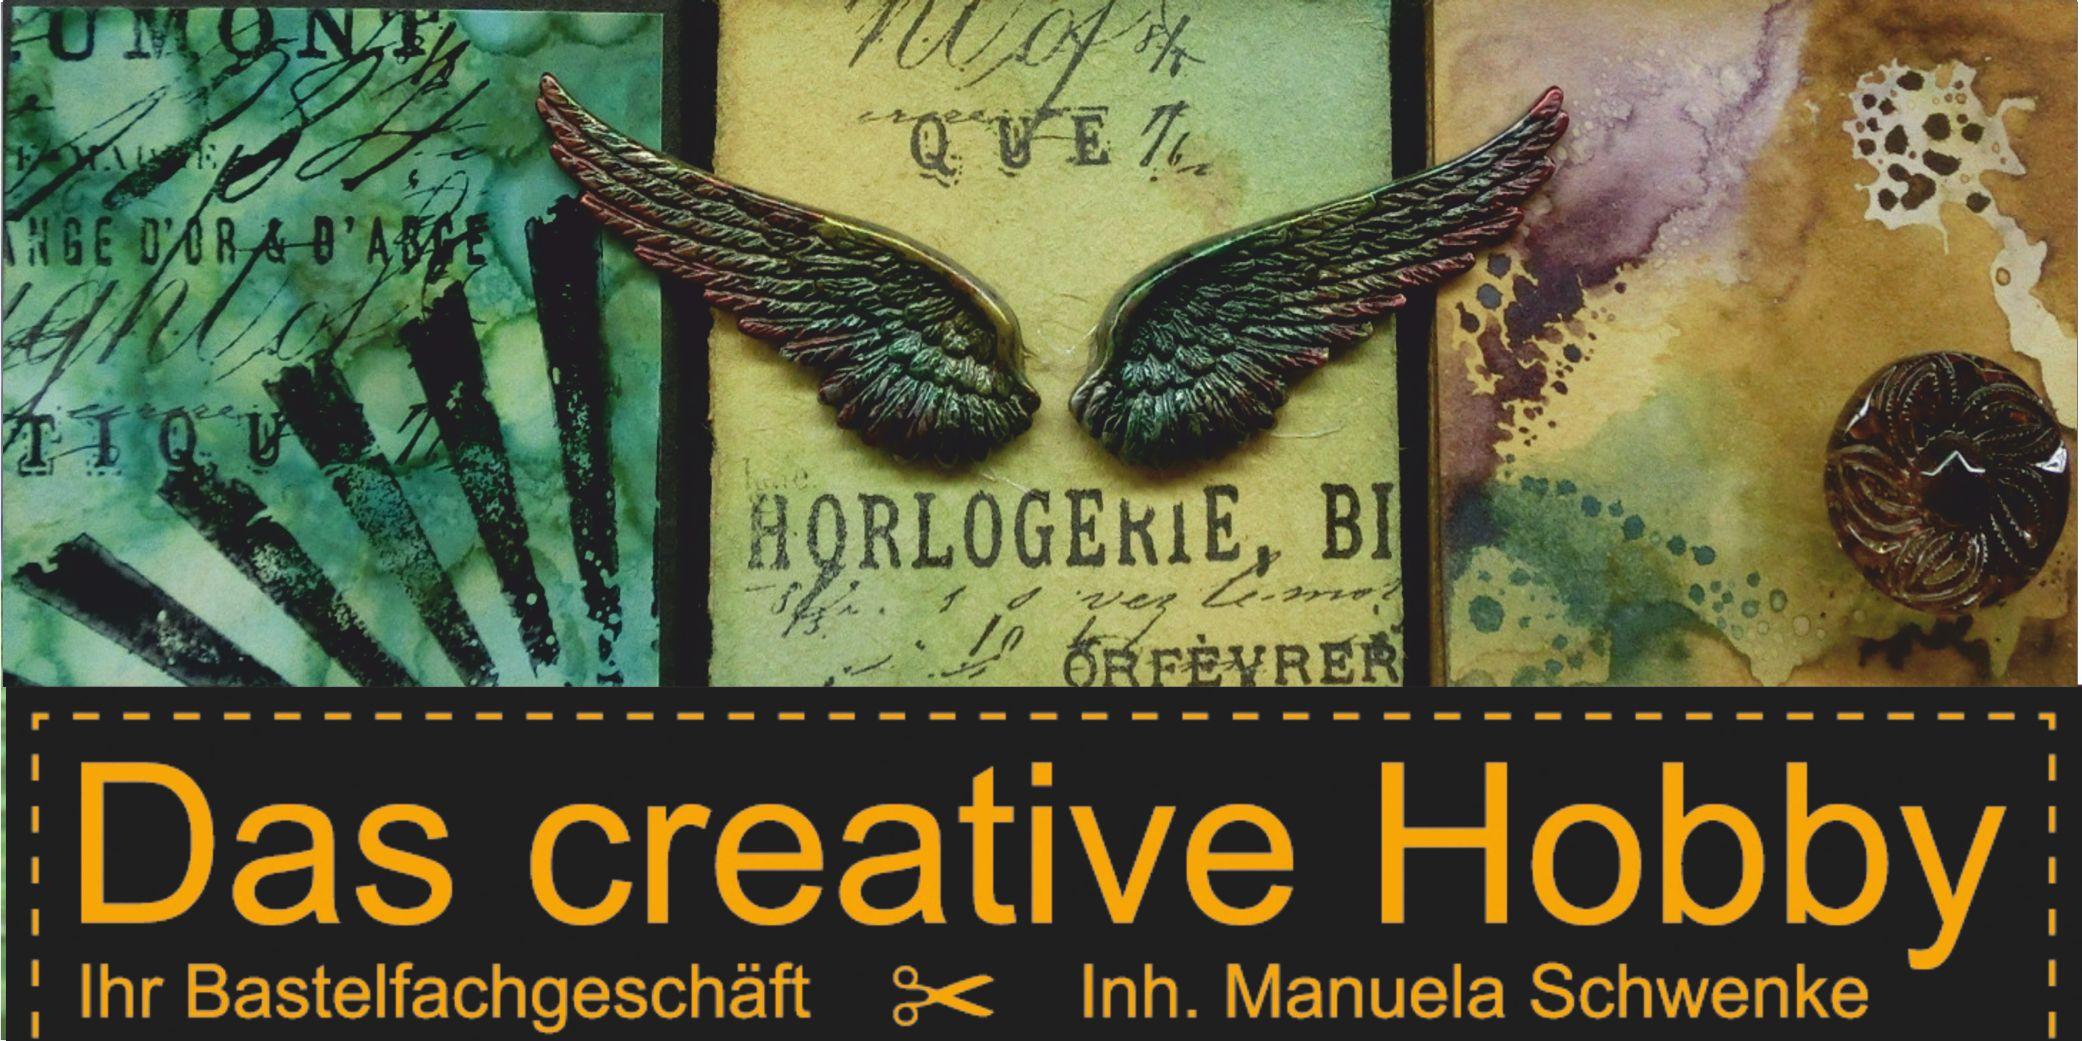 Neu: Kreativkurse im creativen Hobby